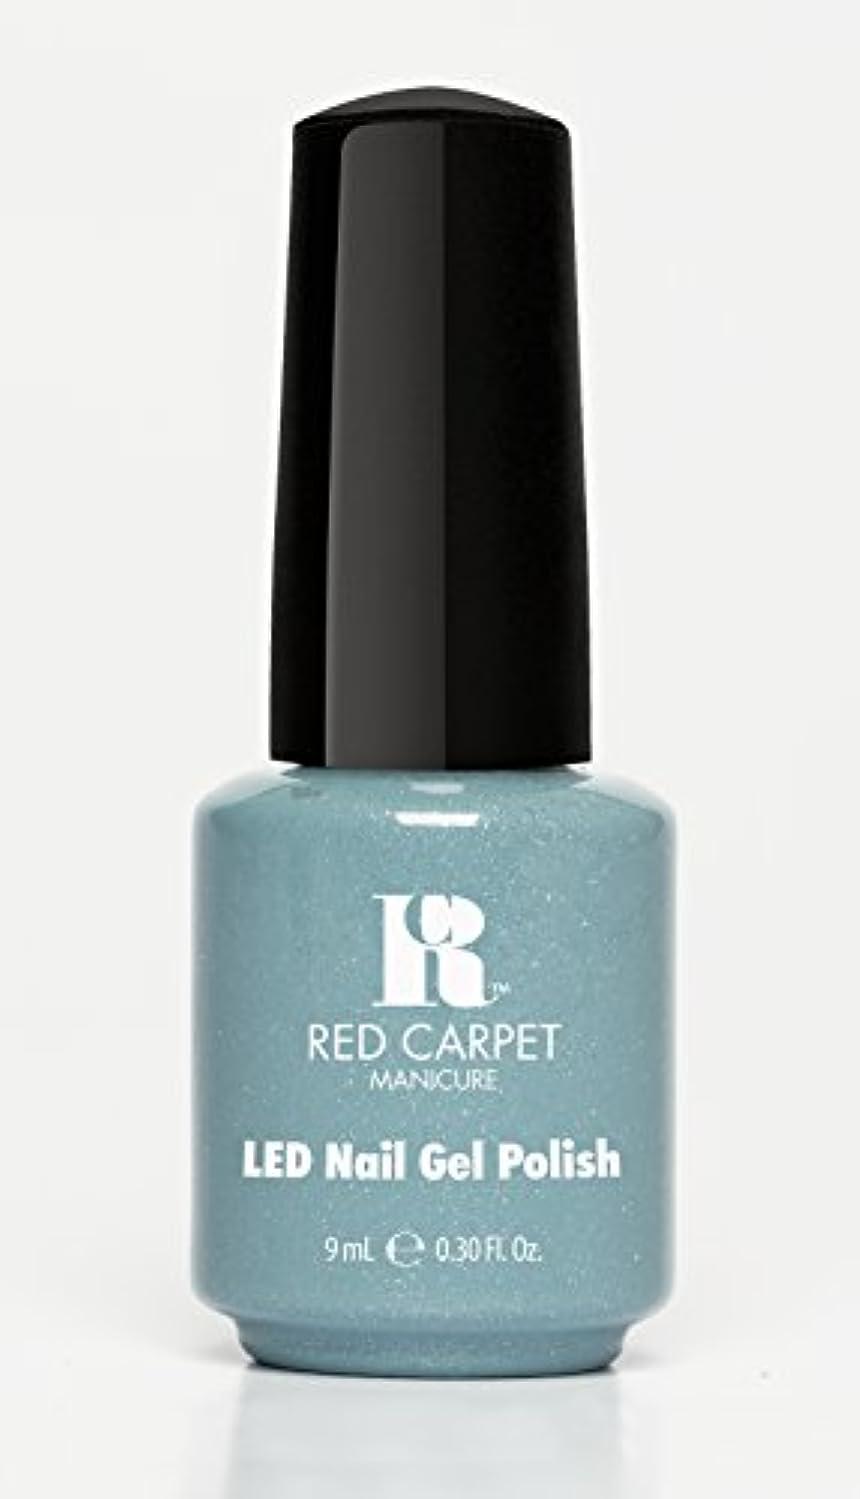 Red Carpet Manicure - LED Nail Gel Polish - Power of the Gemstones - Aquamarine - 0.3oz/9ml